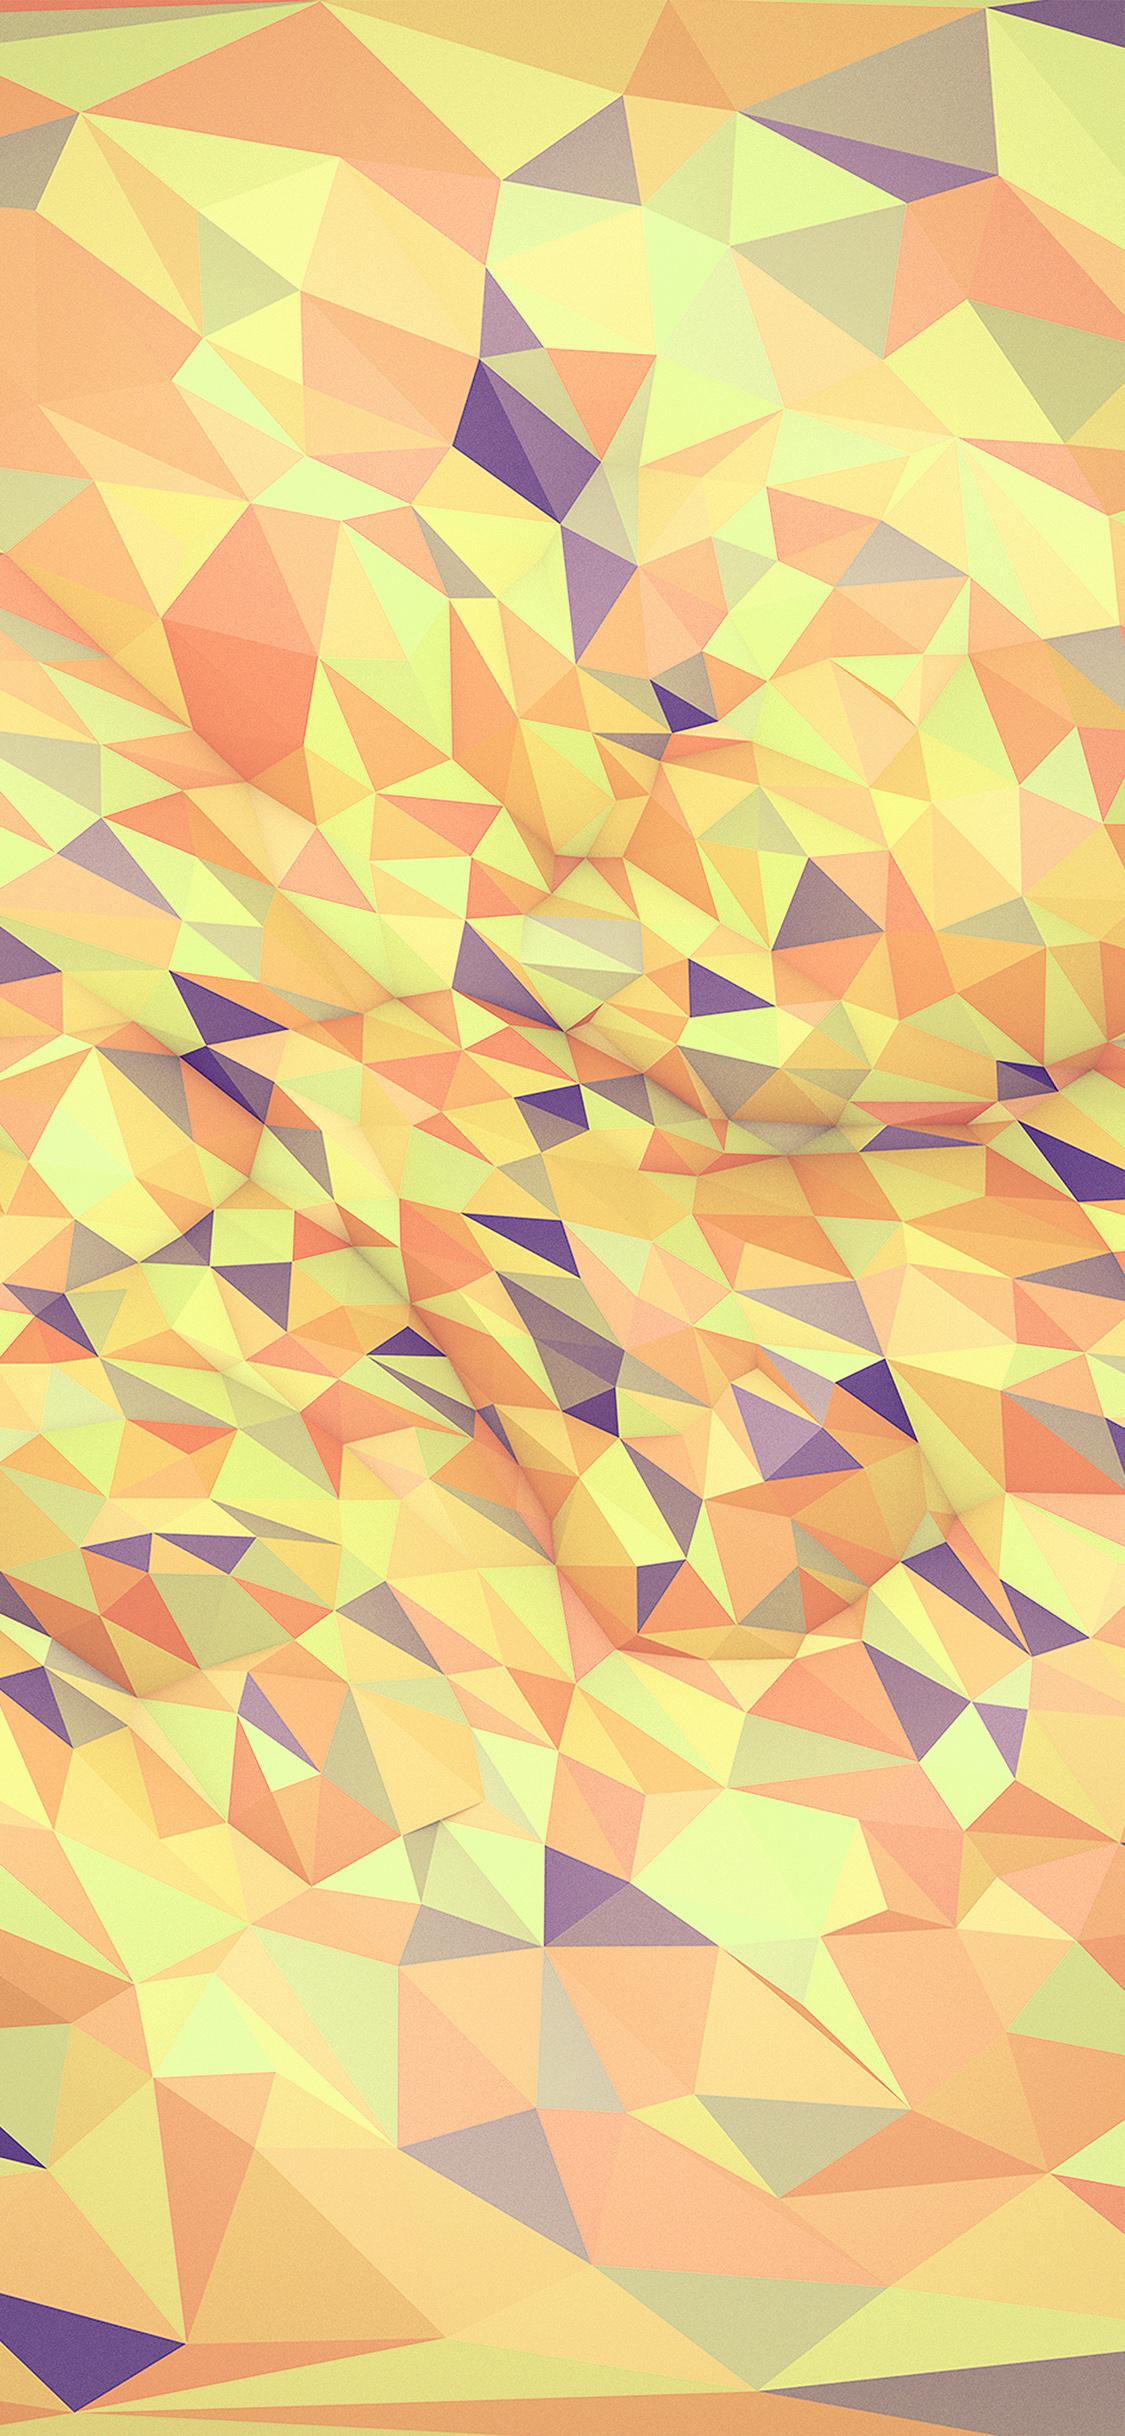 iPhonexpapers.com-Apple-iPhone-wallpaper-vr58-metaphysics-hampus-olsson-art-orange-yellow-polygon-pattern